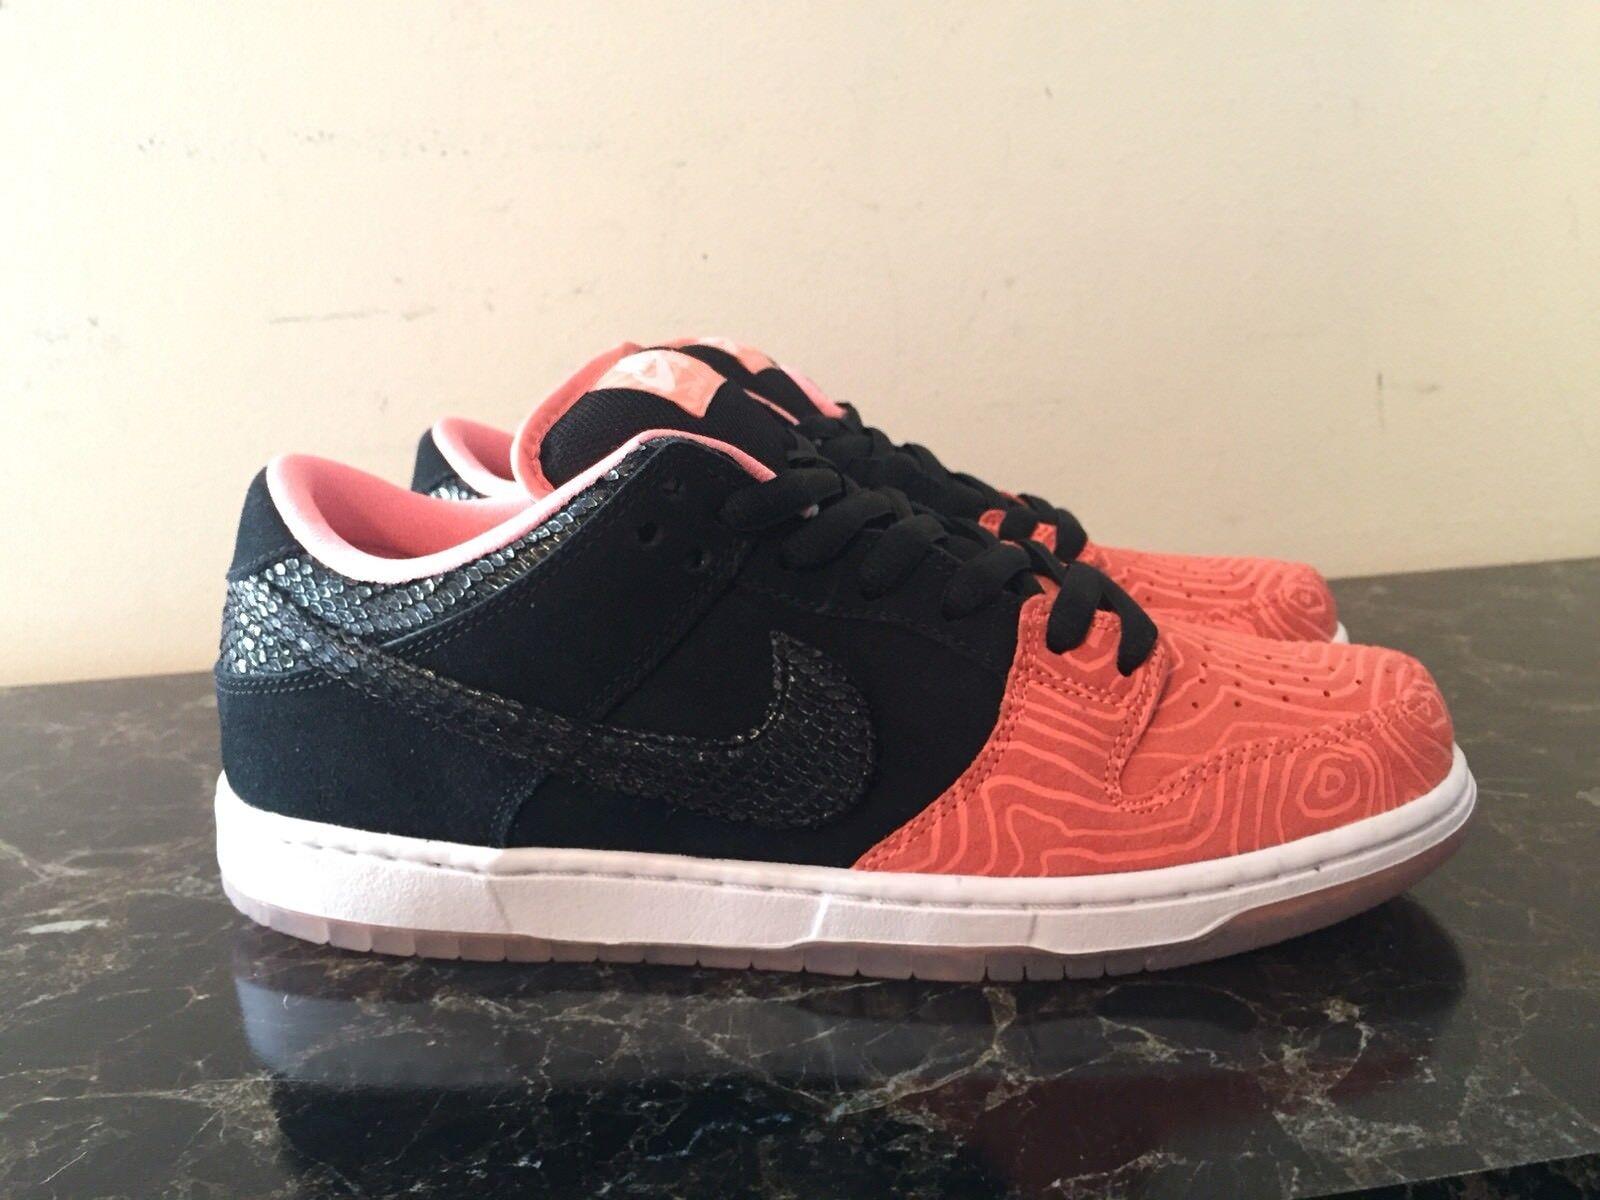 Nike e basso premio sb premier sz